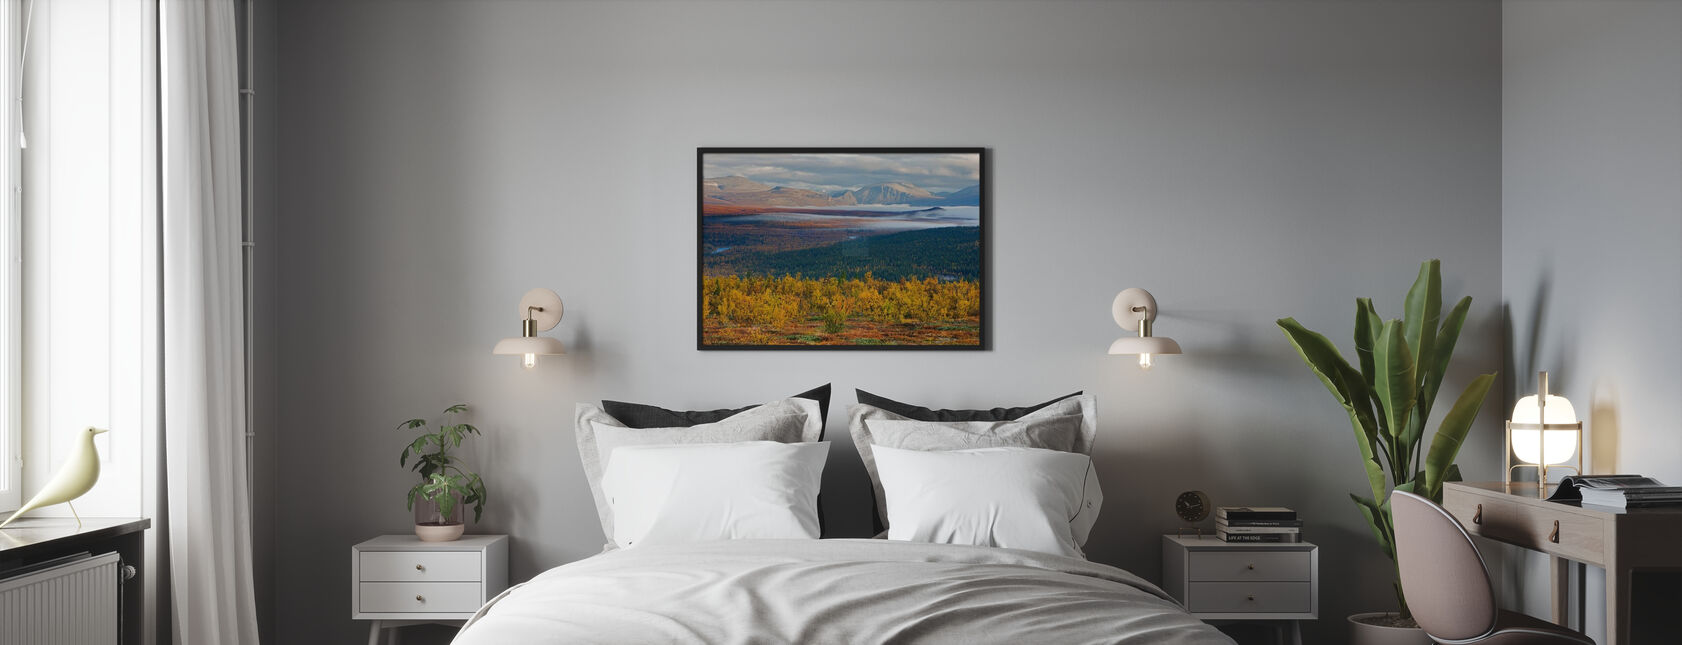 Herfst in Abisko - Poster - Slaapkamer